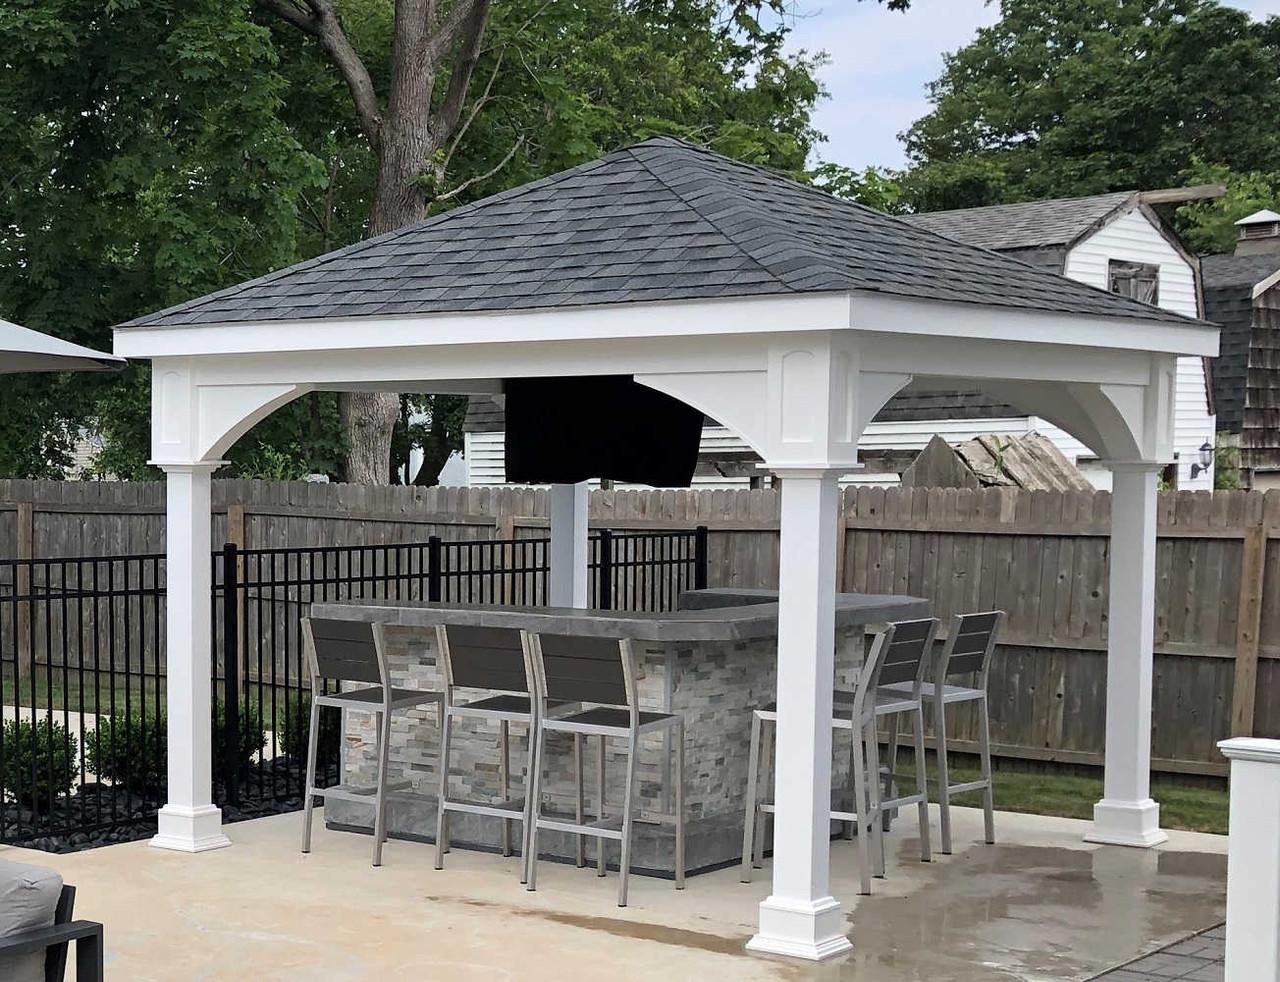 11x12 Traditional (Hip) Roof Vinyl Pavilion Kit, Atlantic Highlands, New Jersey